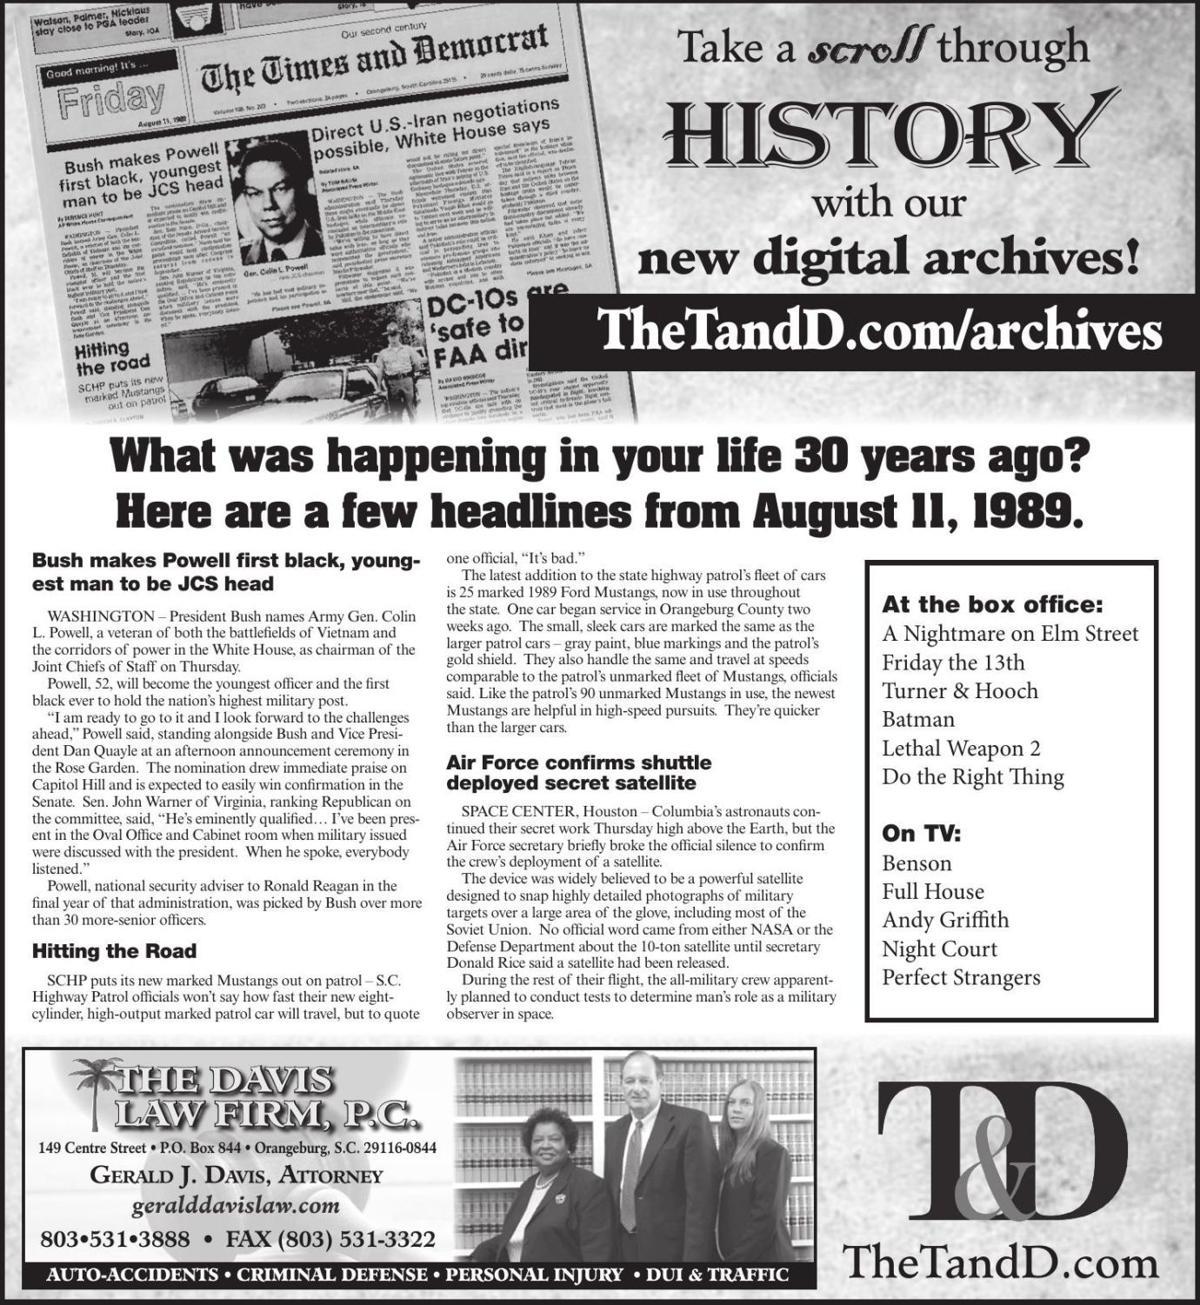 TheTandD.com/archives Aug. 11, 2019